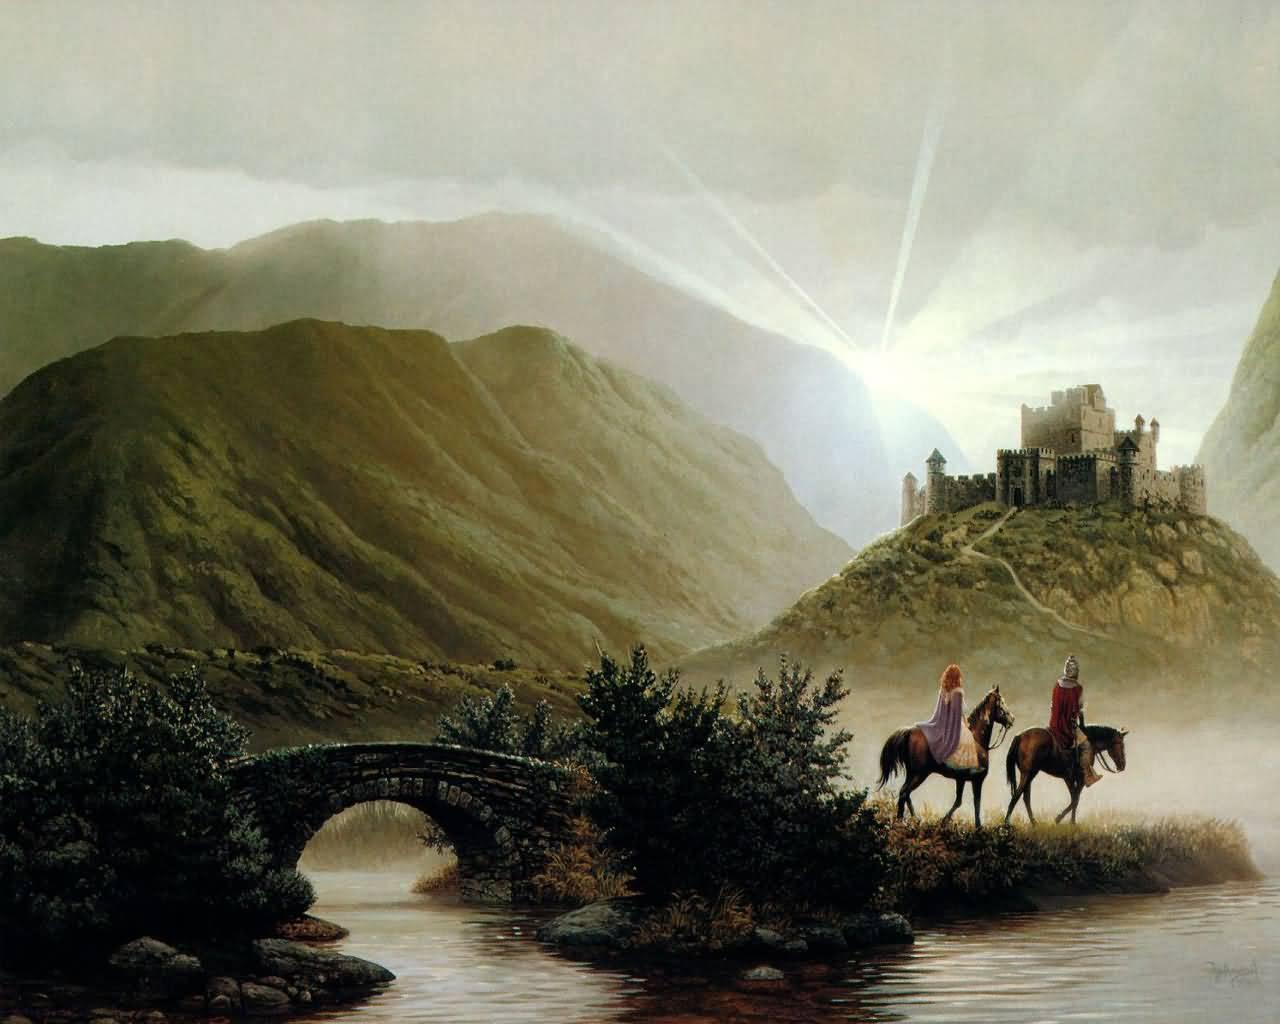 http://1.bp.blogspot.com/-Cx5ujlHXcN8/T6dAYPl3FqI/AAAAAAAAA0s/u76gvsjZFmw/s1600/castle-fantasy-wallpapers.jpg